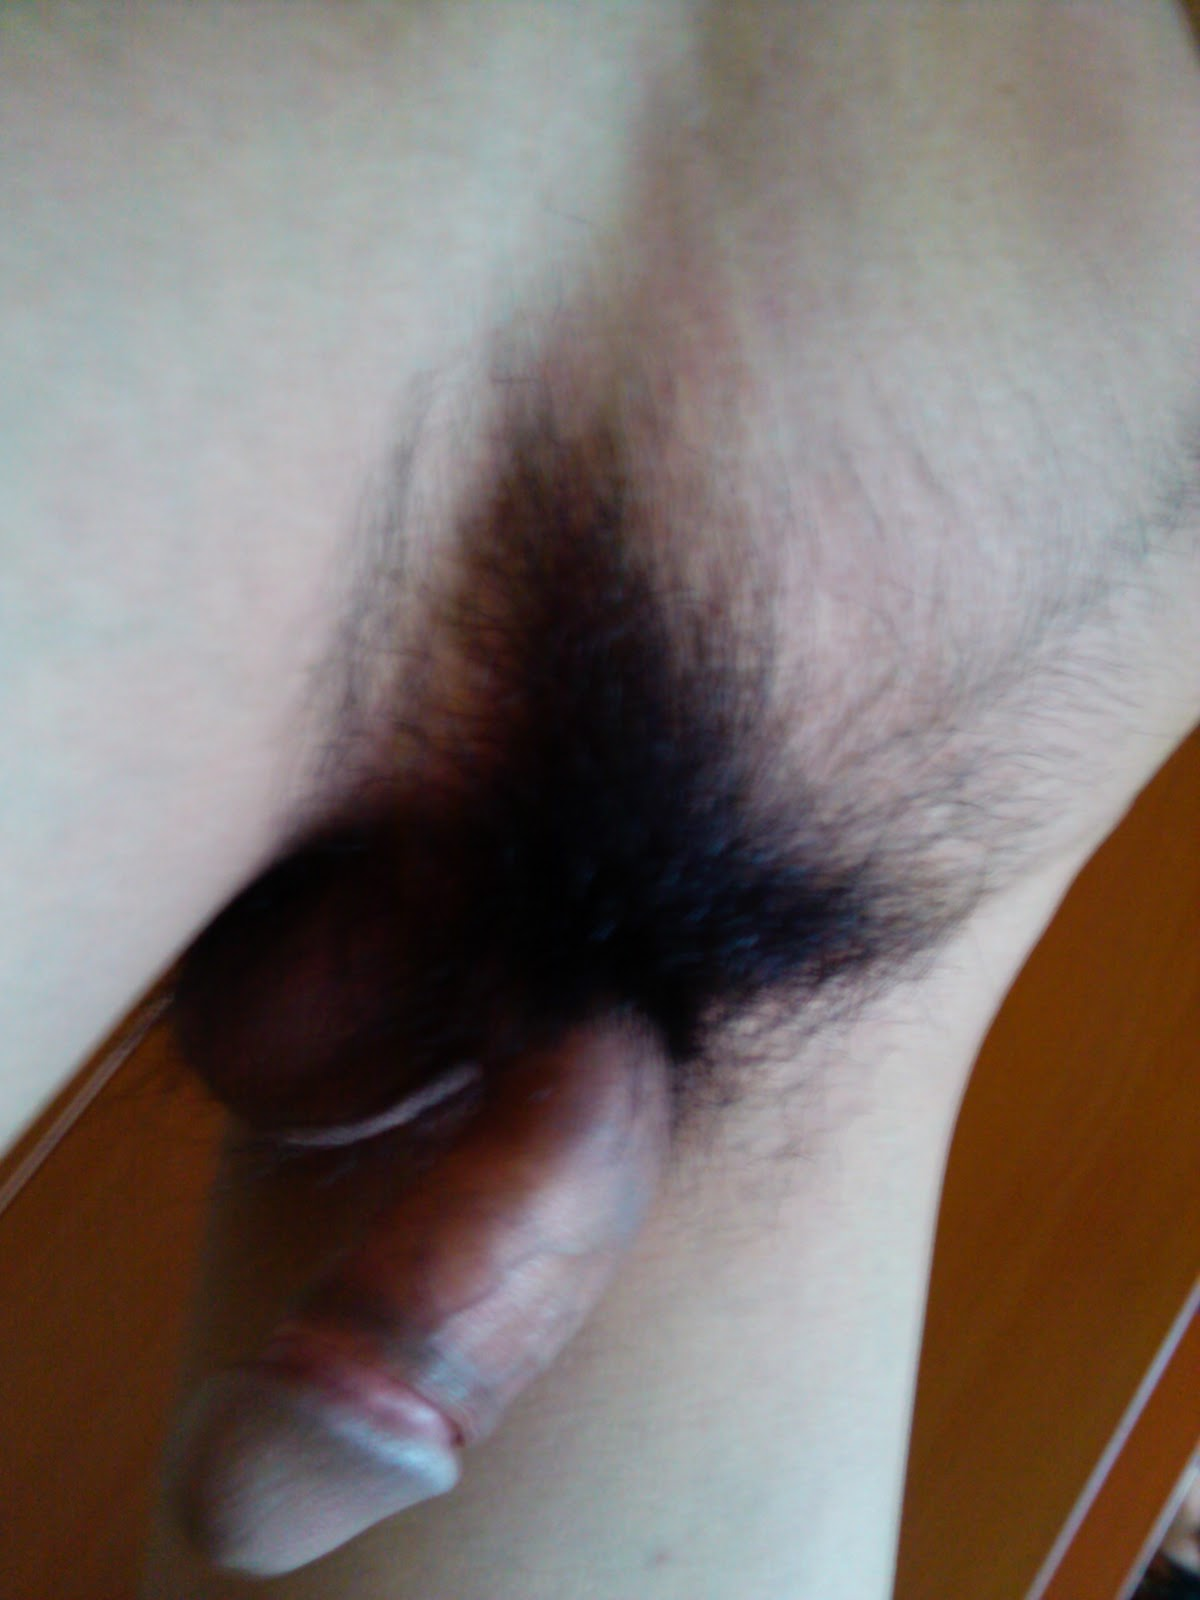 http://2.bp.blogspot.com/_et5DT8CG1y4/TTr2lDjUovI/AAAAAAAAADc/ctNVep7o7D0/s1600/2011-01-21+17.29.30.jpg